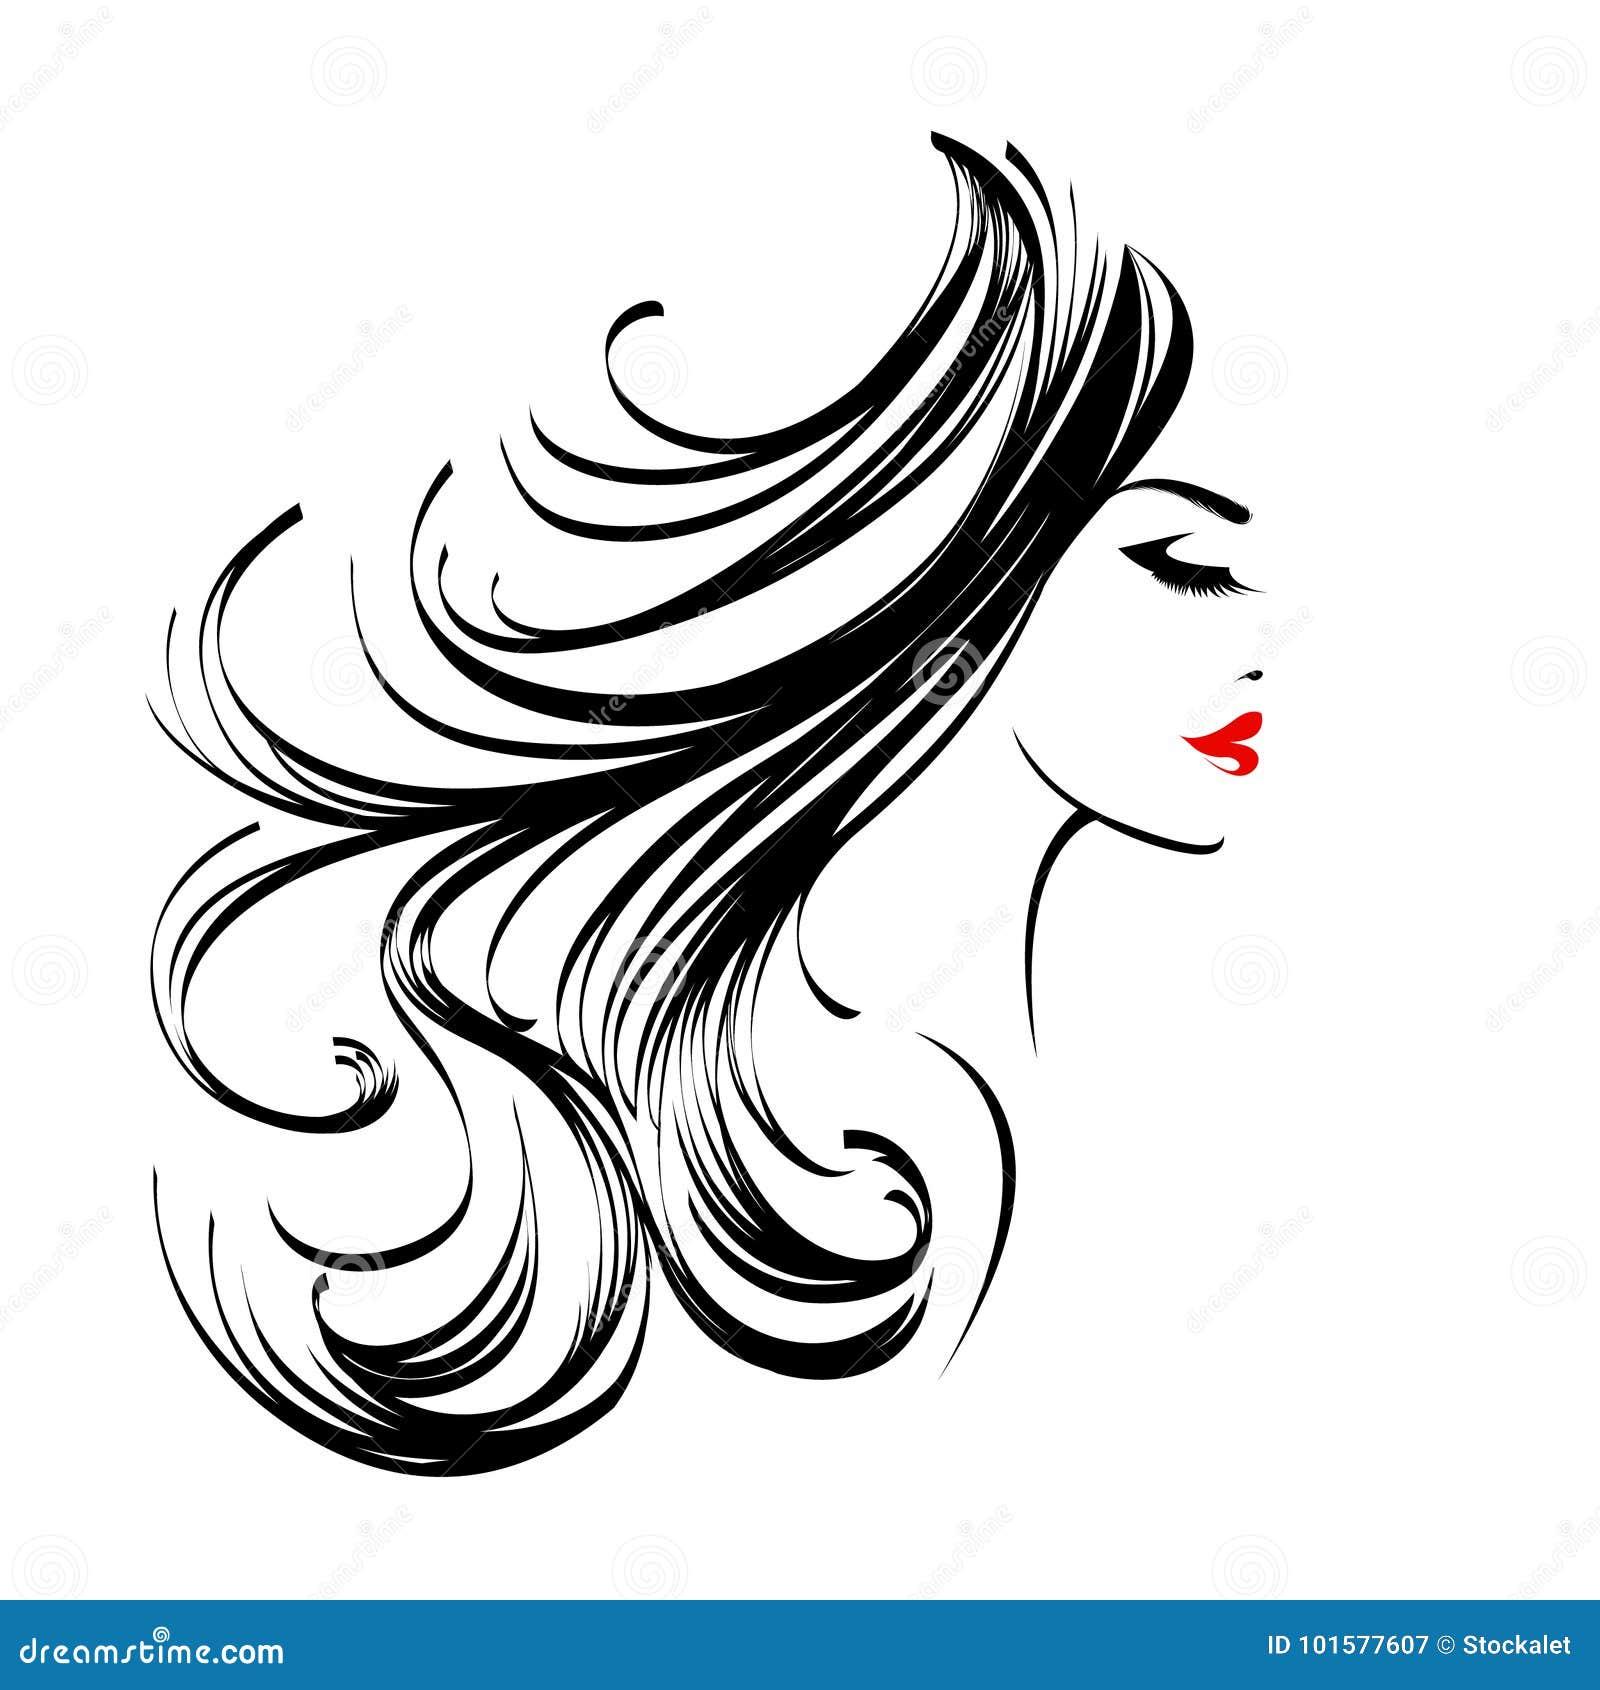 Beautiful woman with long, wavy hair and nice makeup